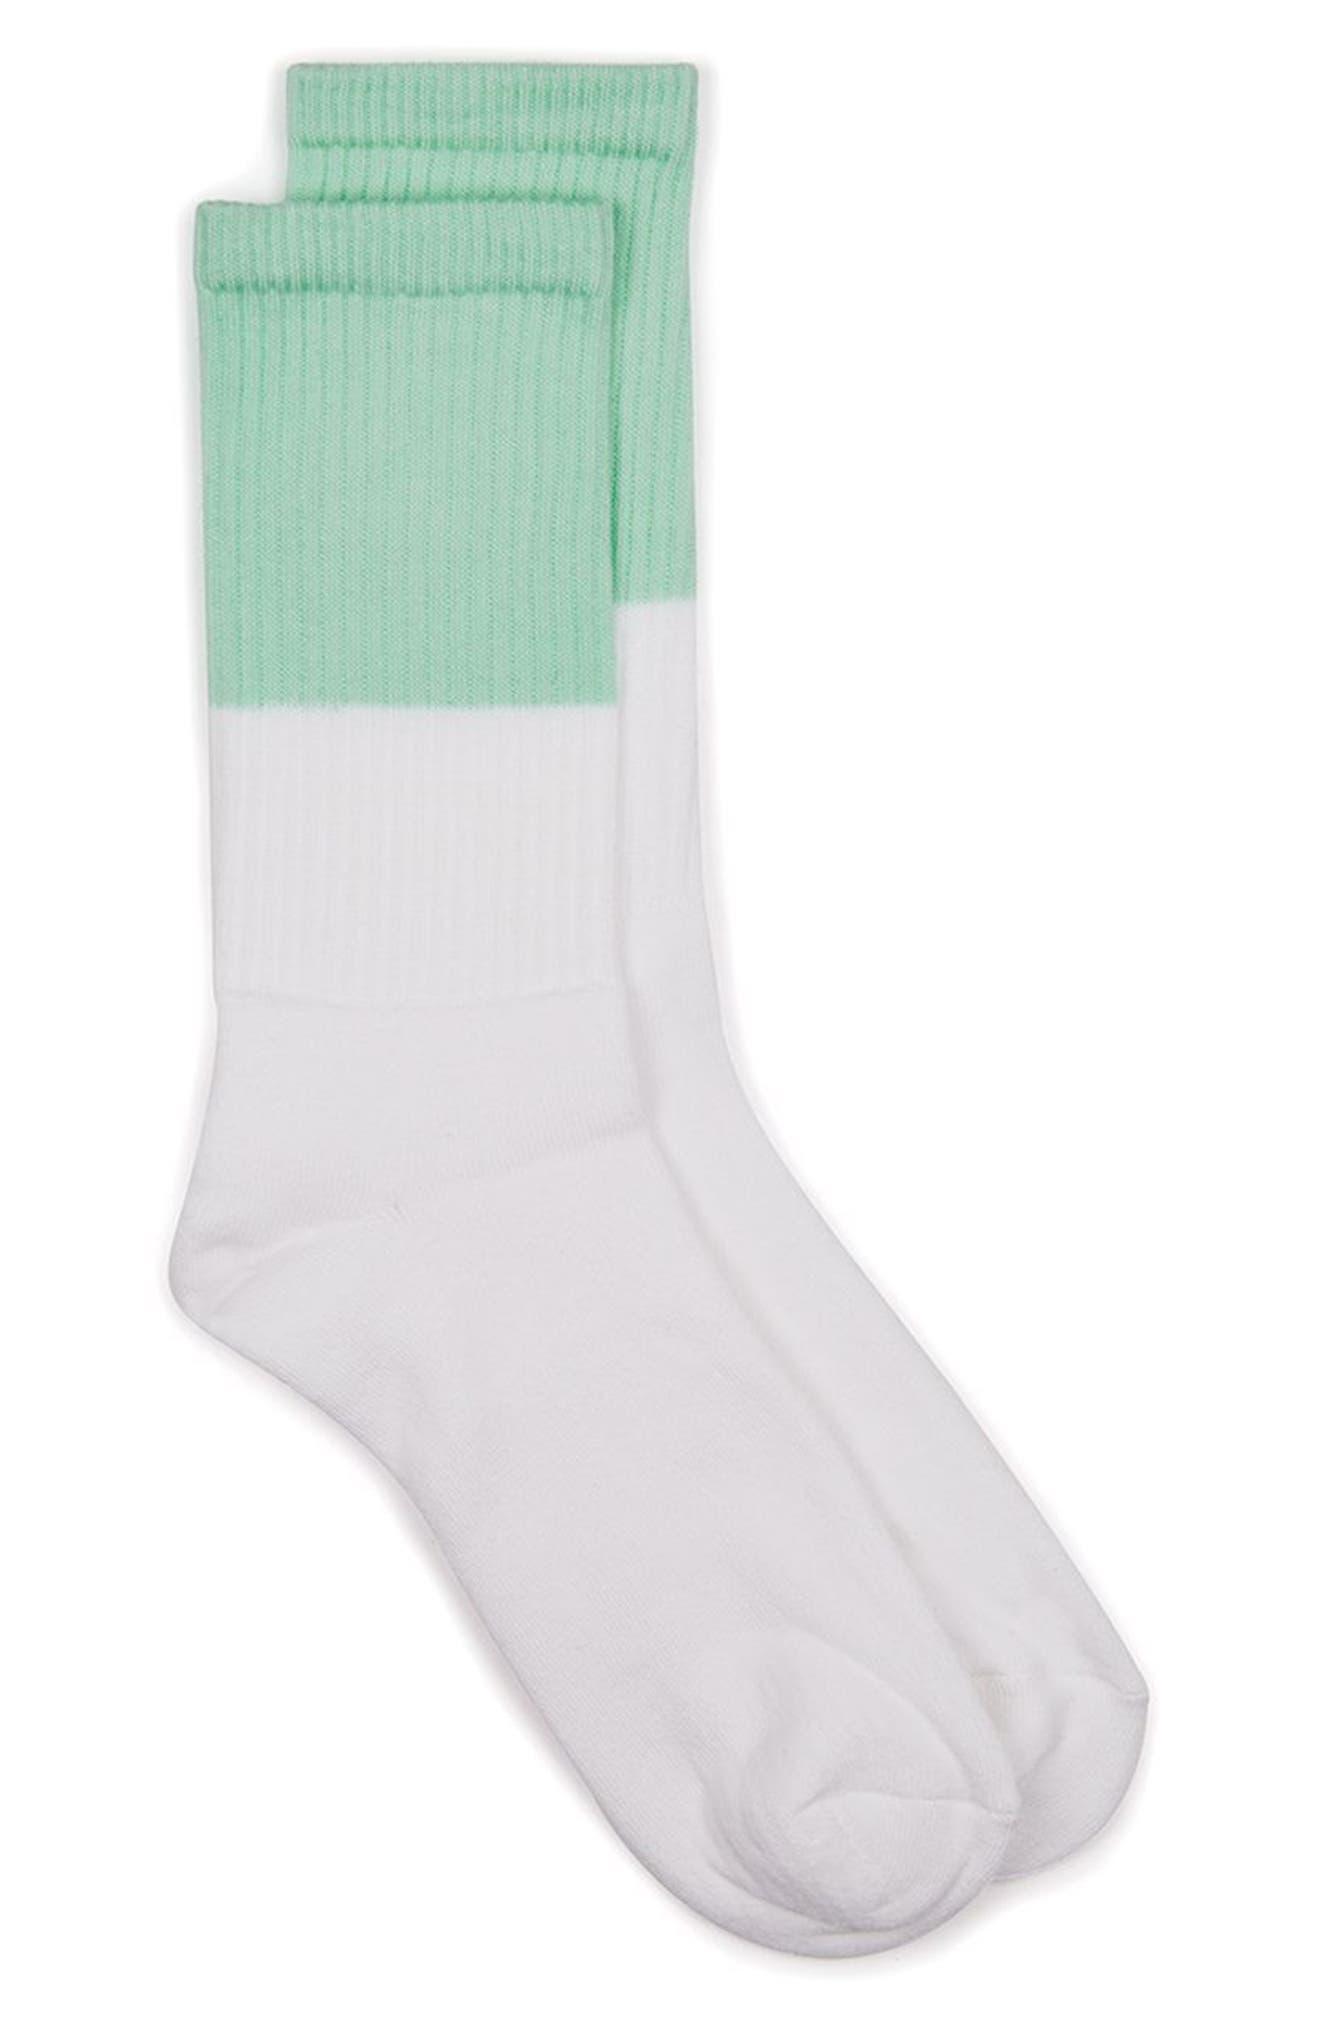 Colorblock Tube Socks,                         Main,                         color, 300